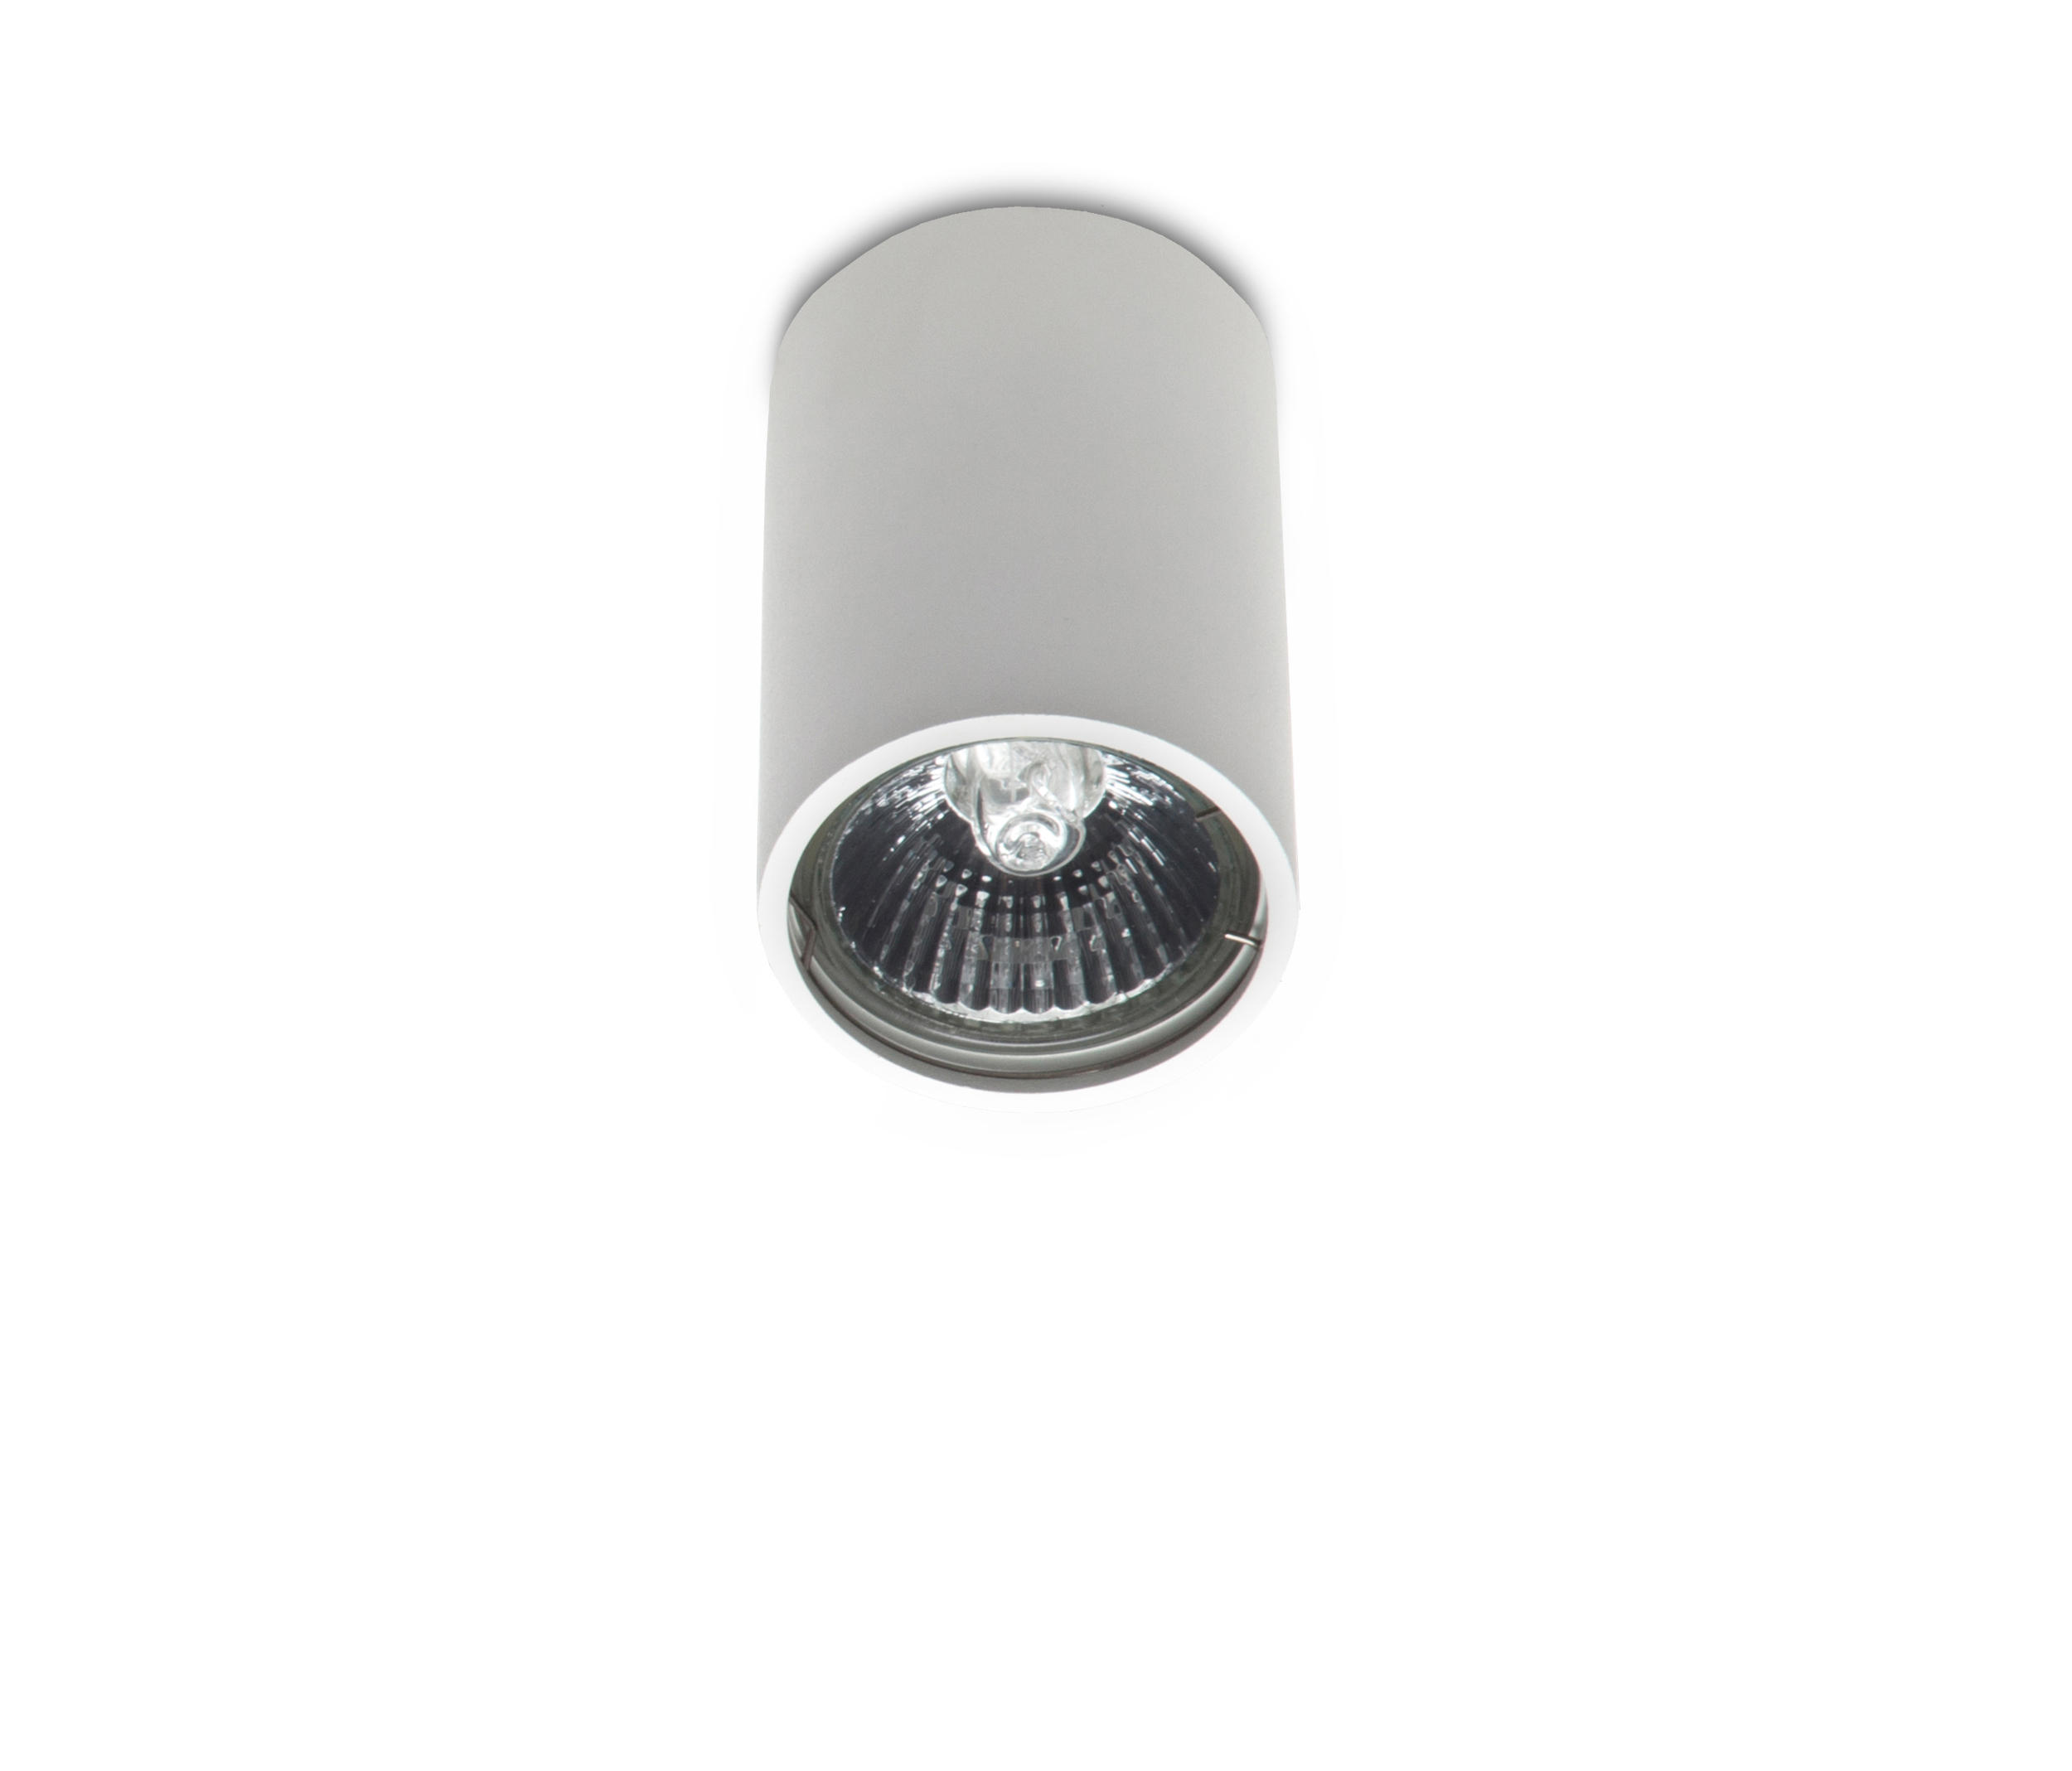 ridu-1x-gu10-50w-led-gu10-bs3771-small-ridu-c-b Wunderschöne Test Led Lampen Gu10 Dekorationen